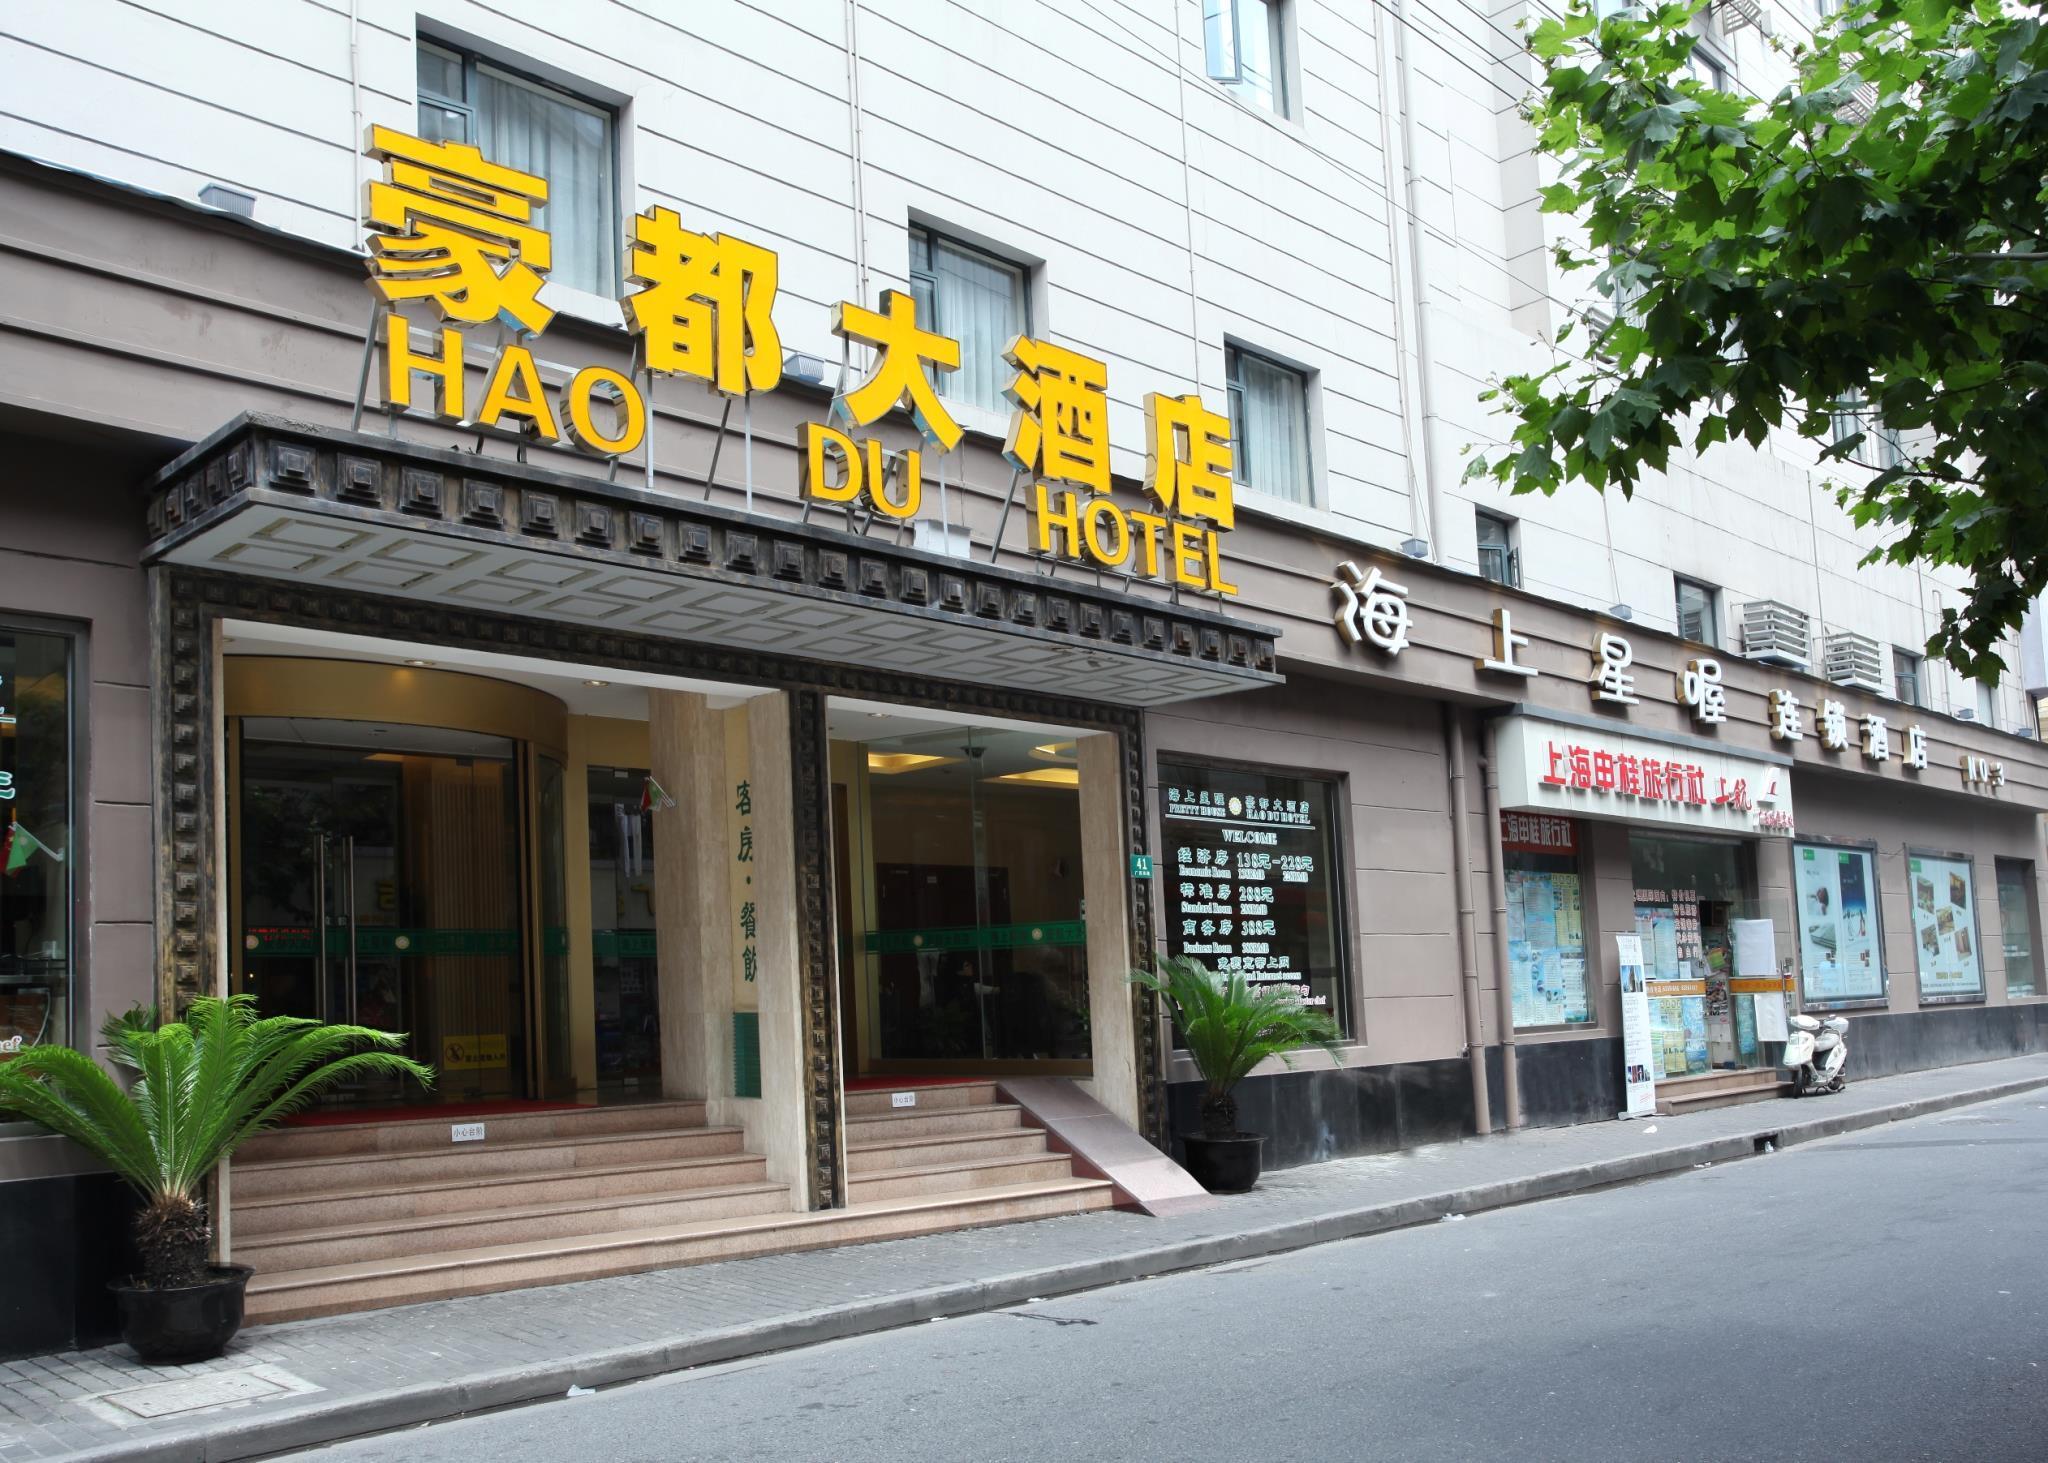 Hao Du Hotel People Square And South Bund Huangpu Shanghai